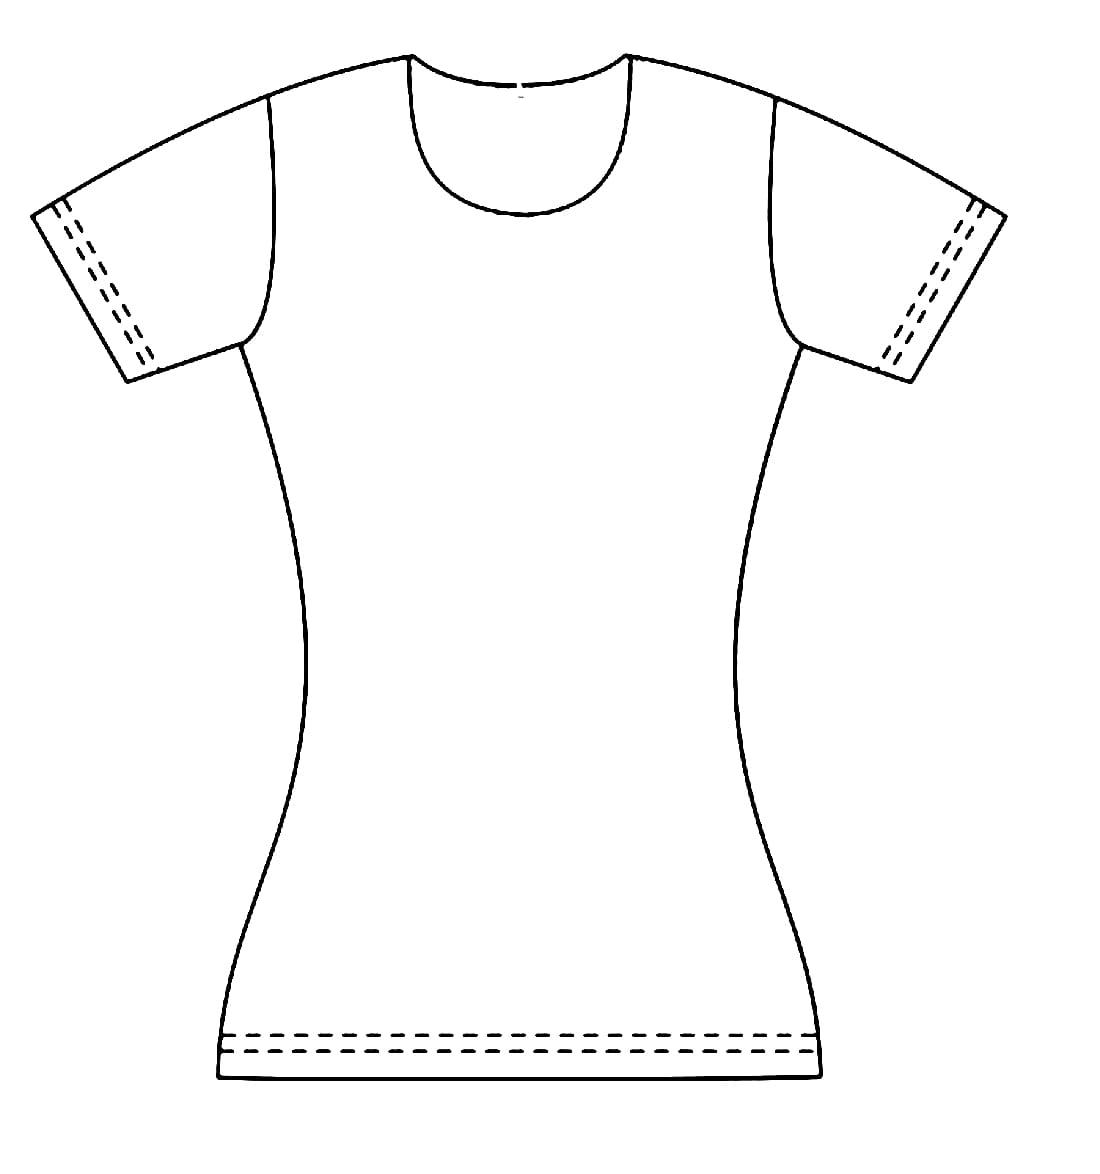 Desenhos de Roupas para colorir. Imprima online90 Imagens